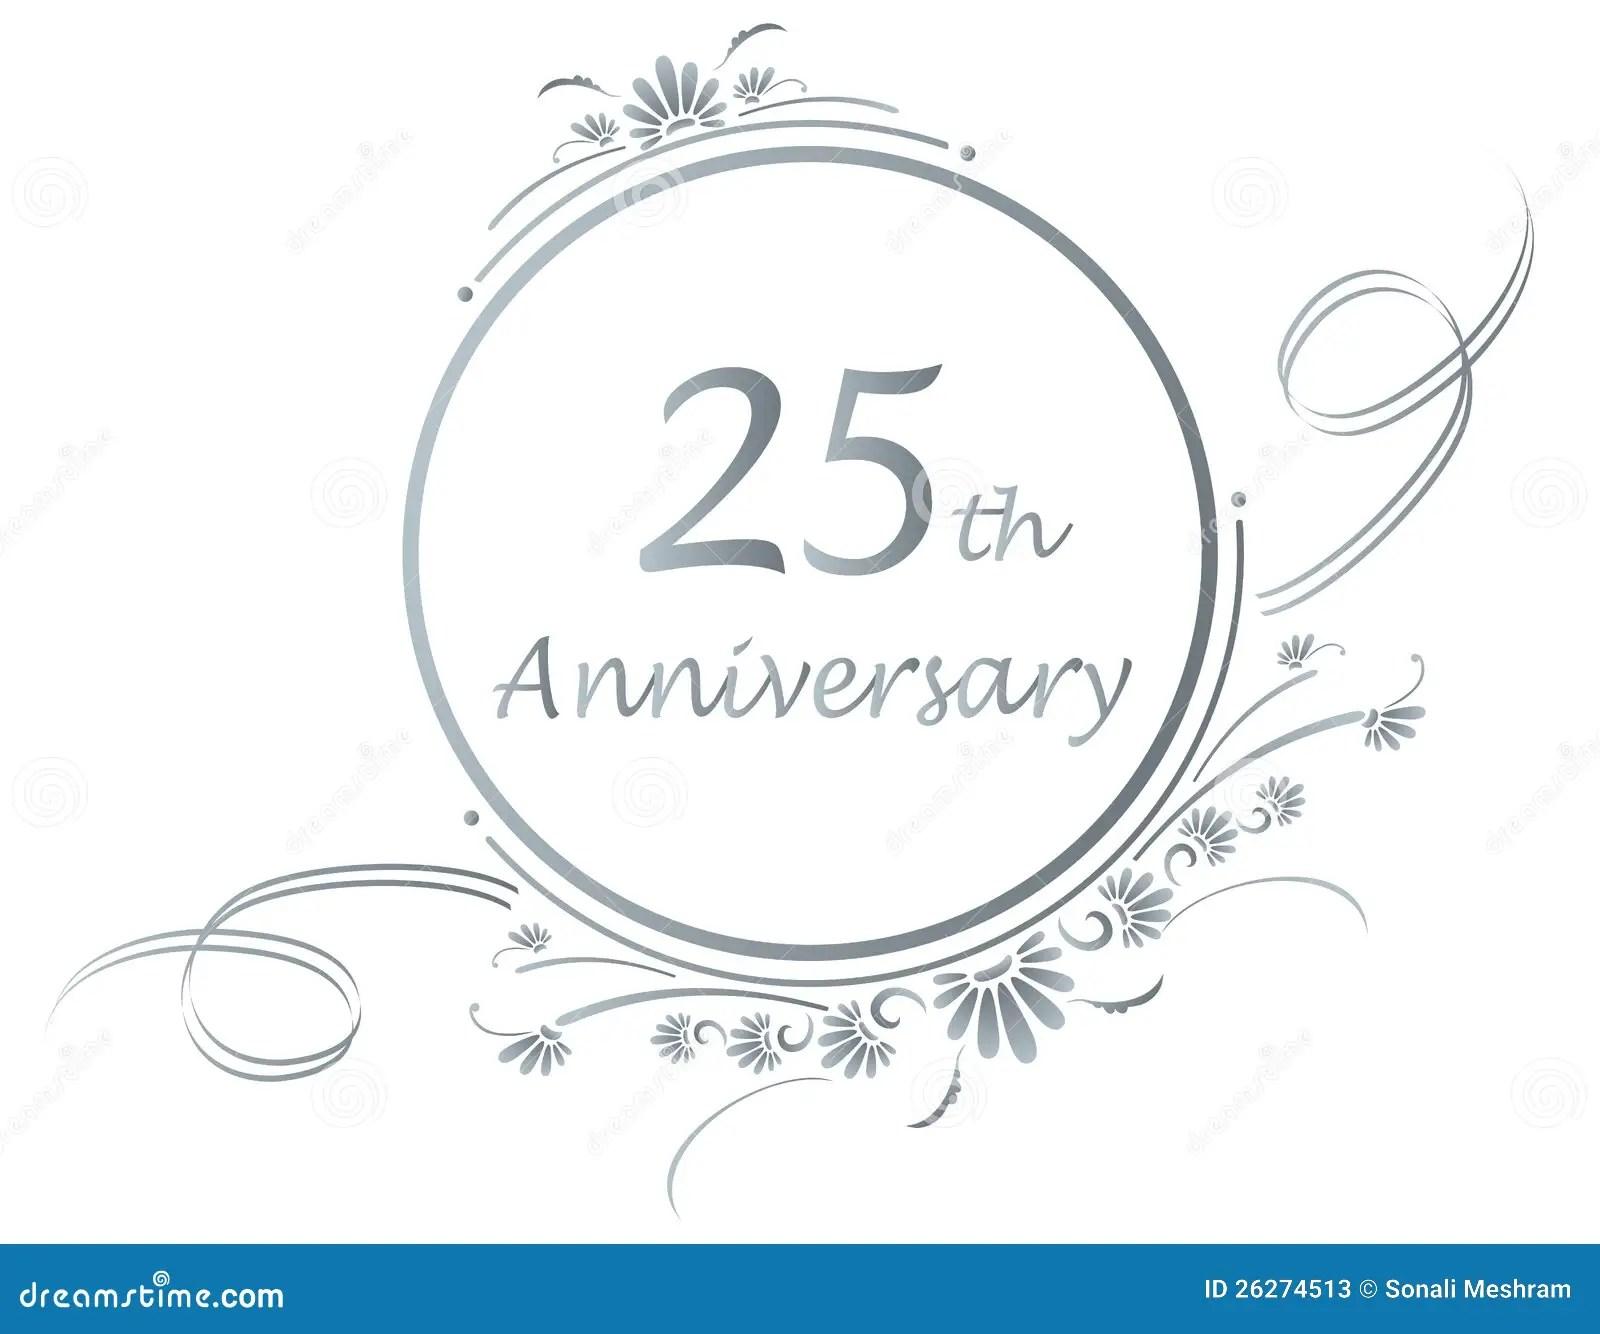 25th Anniversary Design Stock Vector Illustration Of